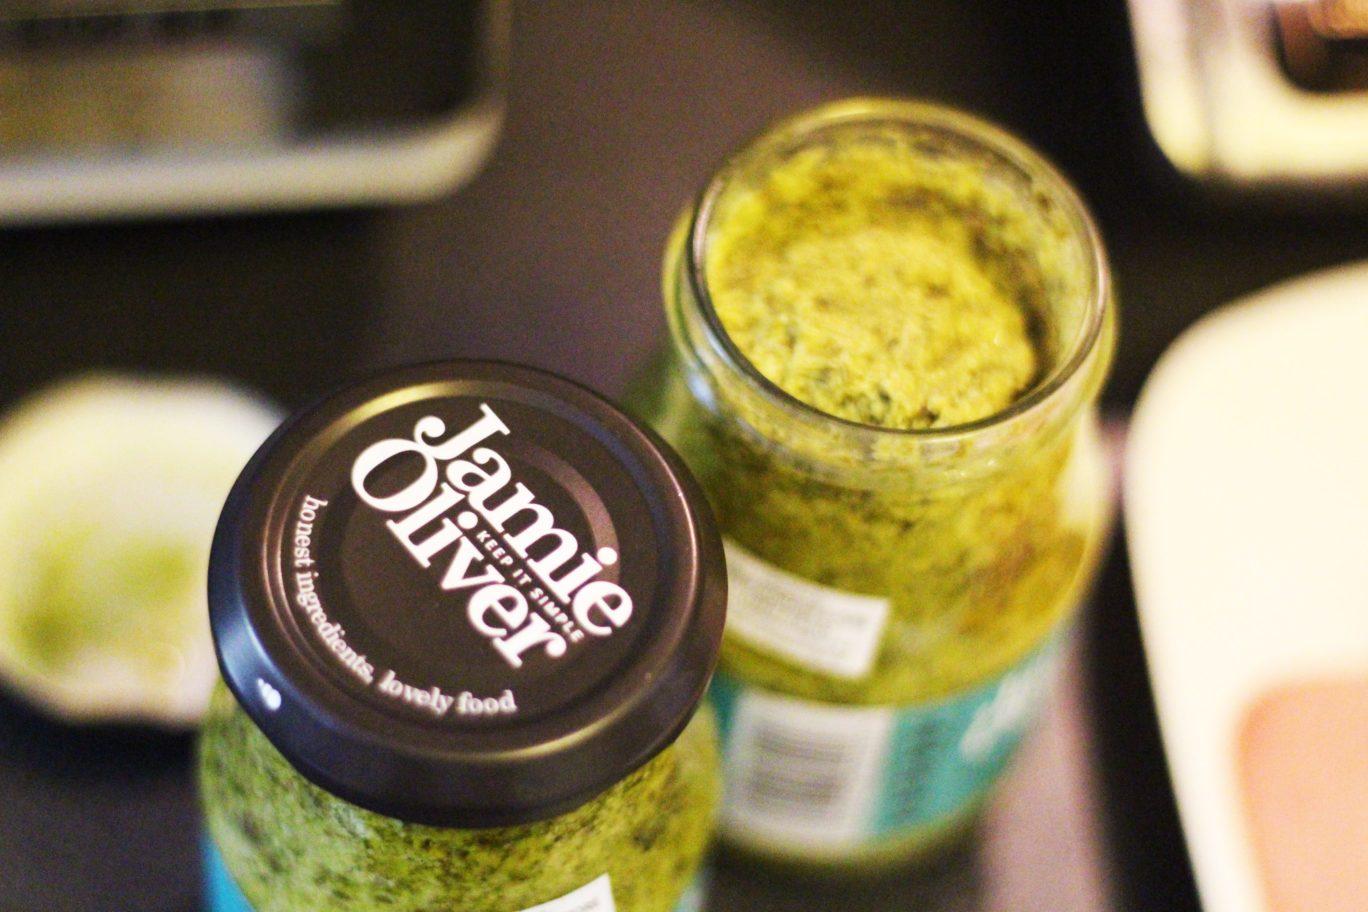 Jamie Oliver's Pesto Pasta Sauce